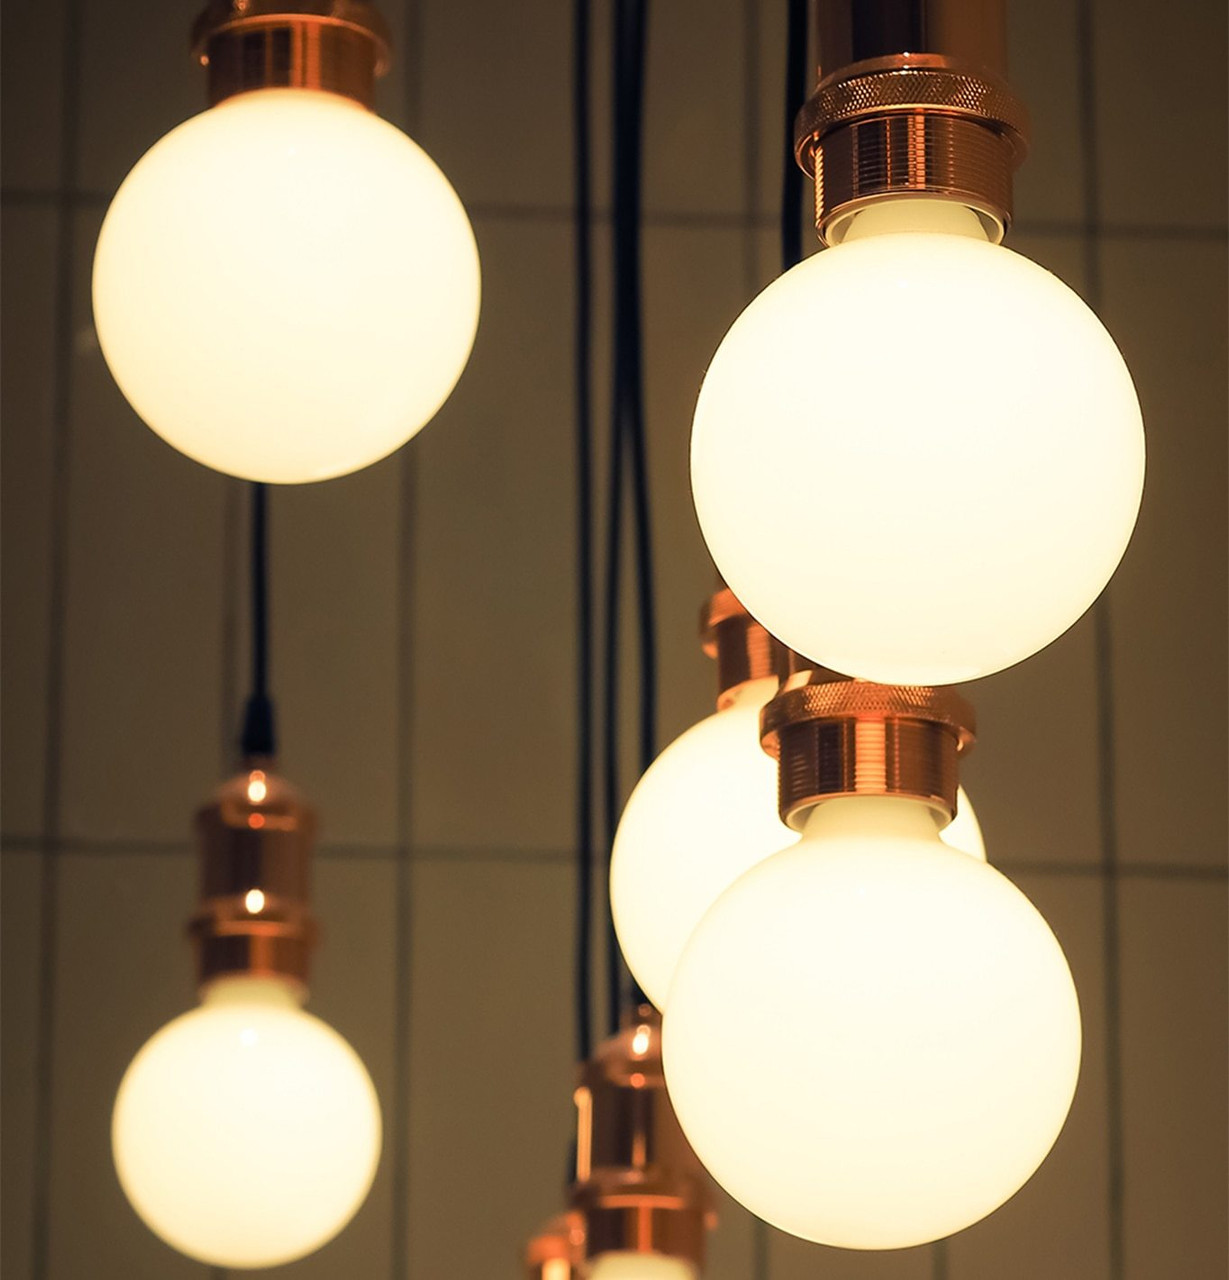 LED Dimmable G125 E27 Light Bulbs